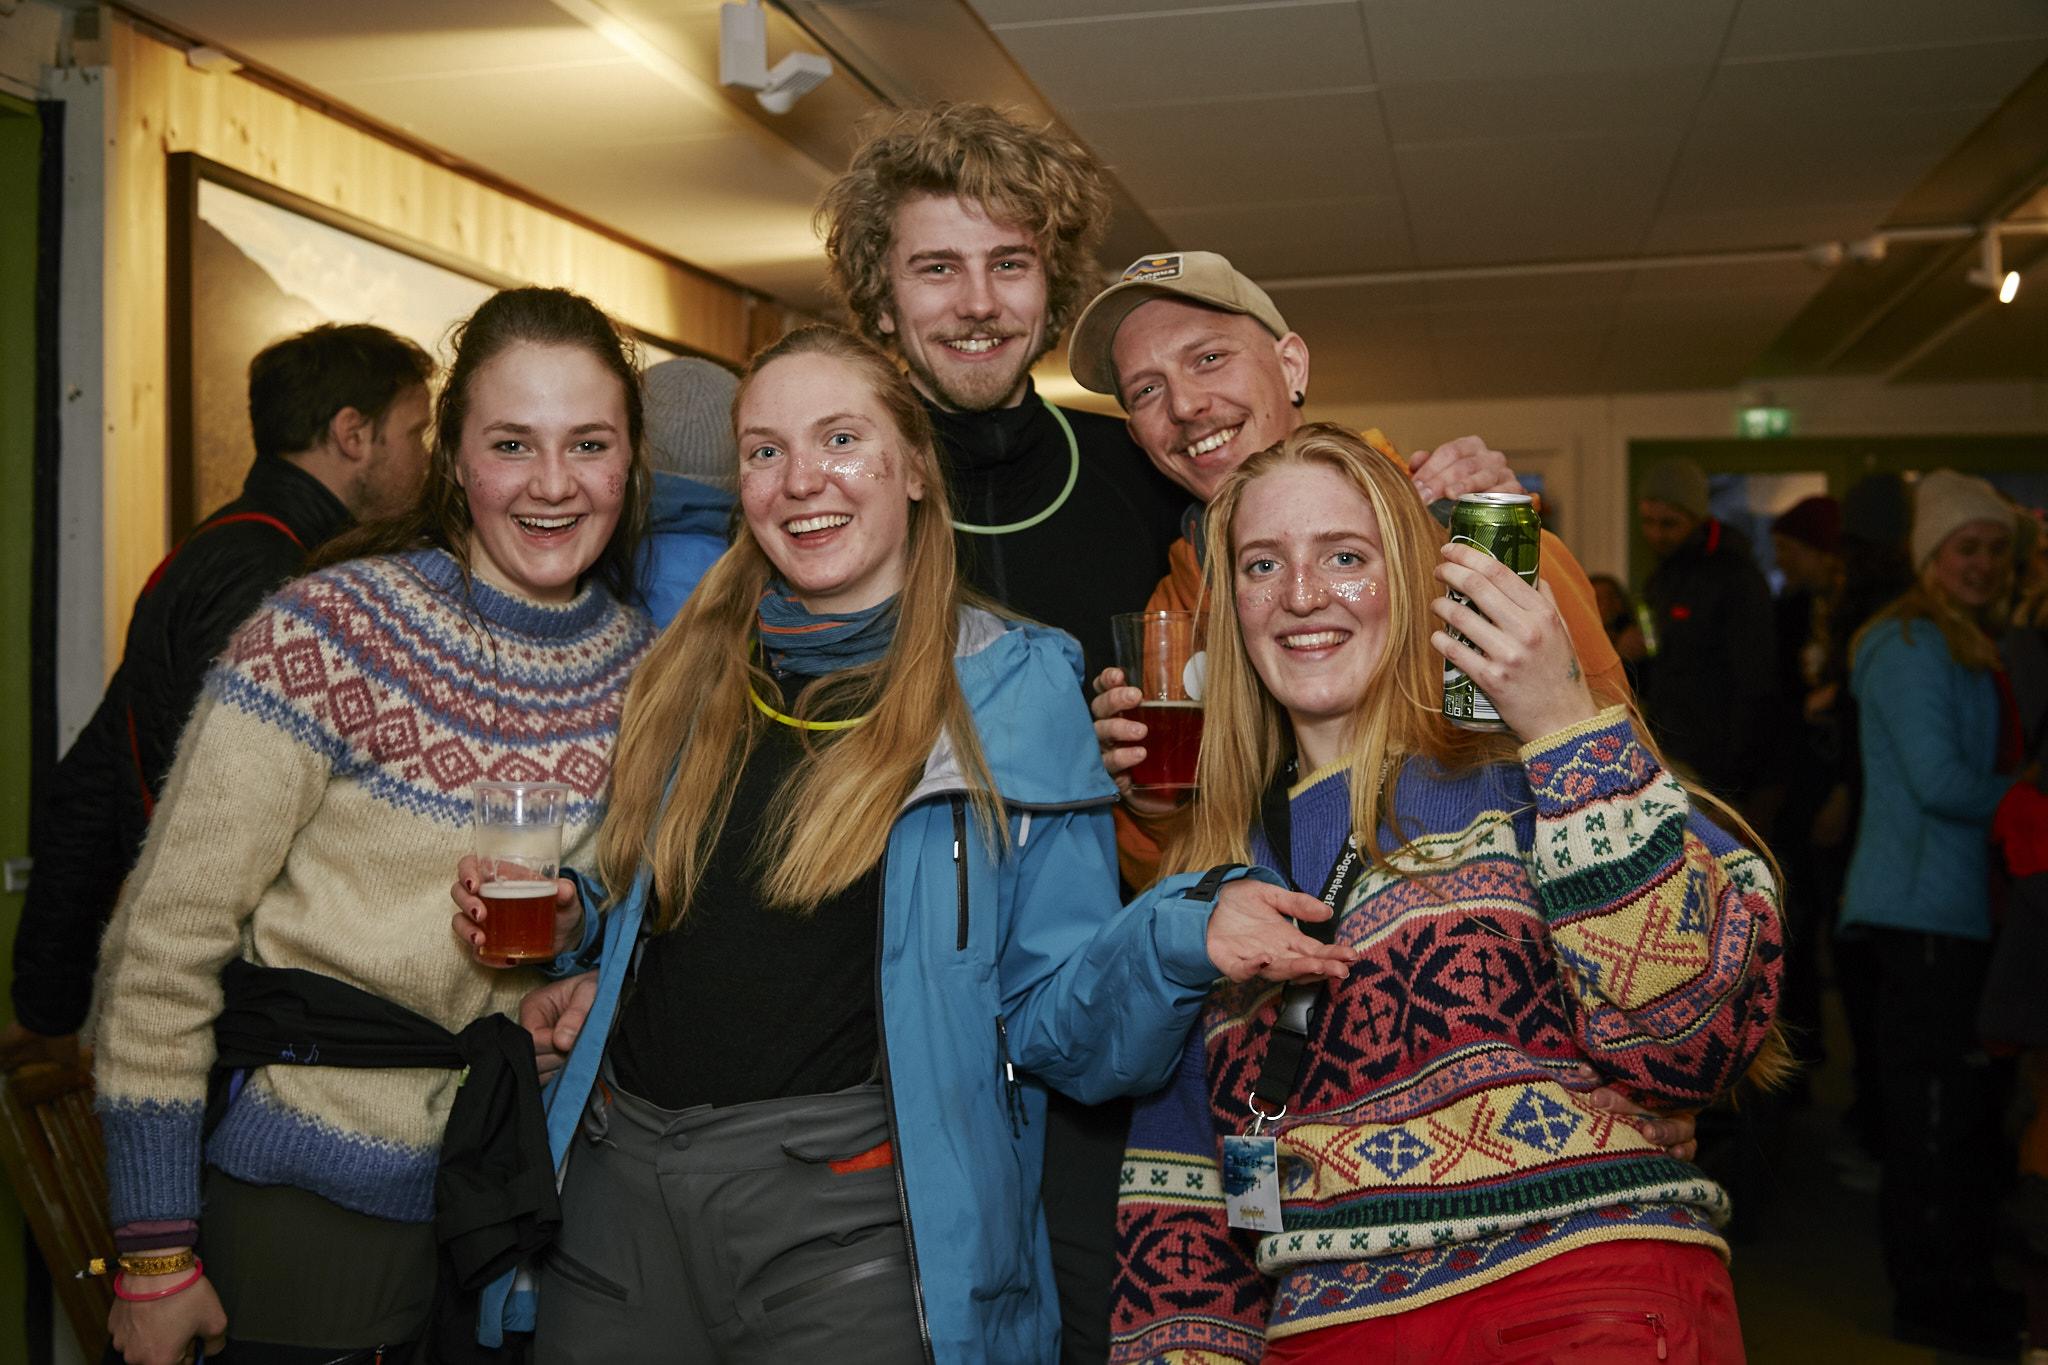 2018.02.22-Fjellsportfestival-Afterski-026.jpg